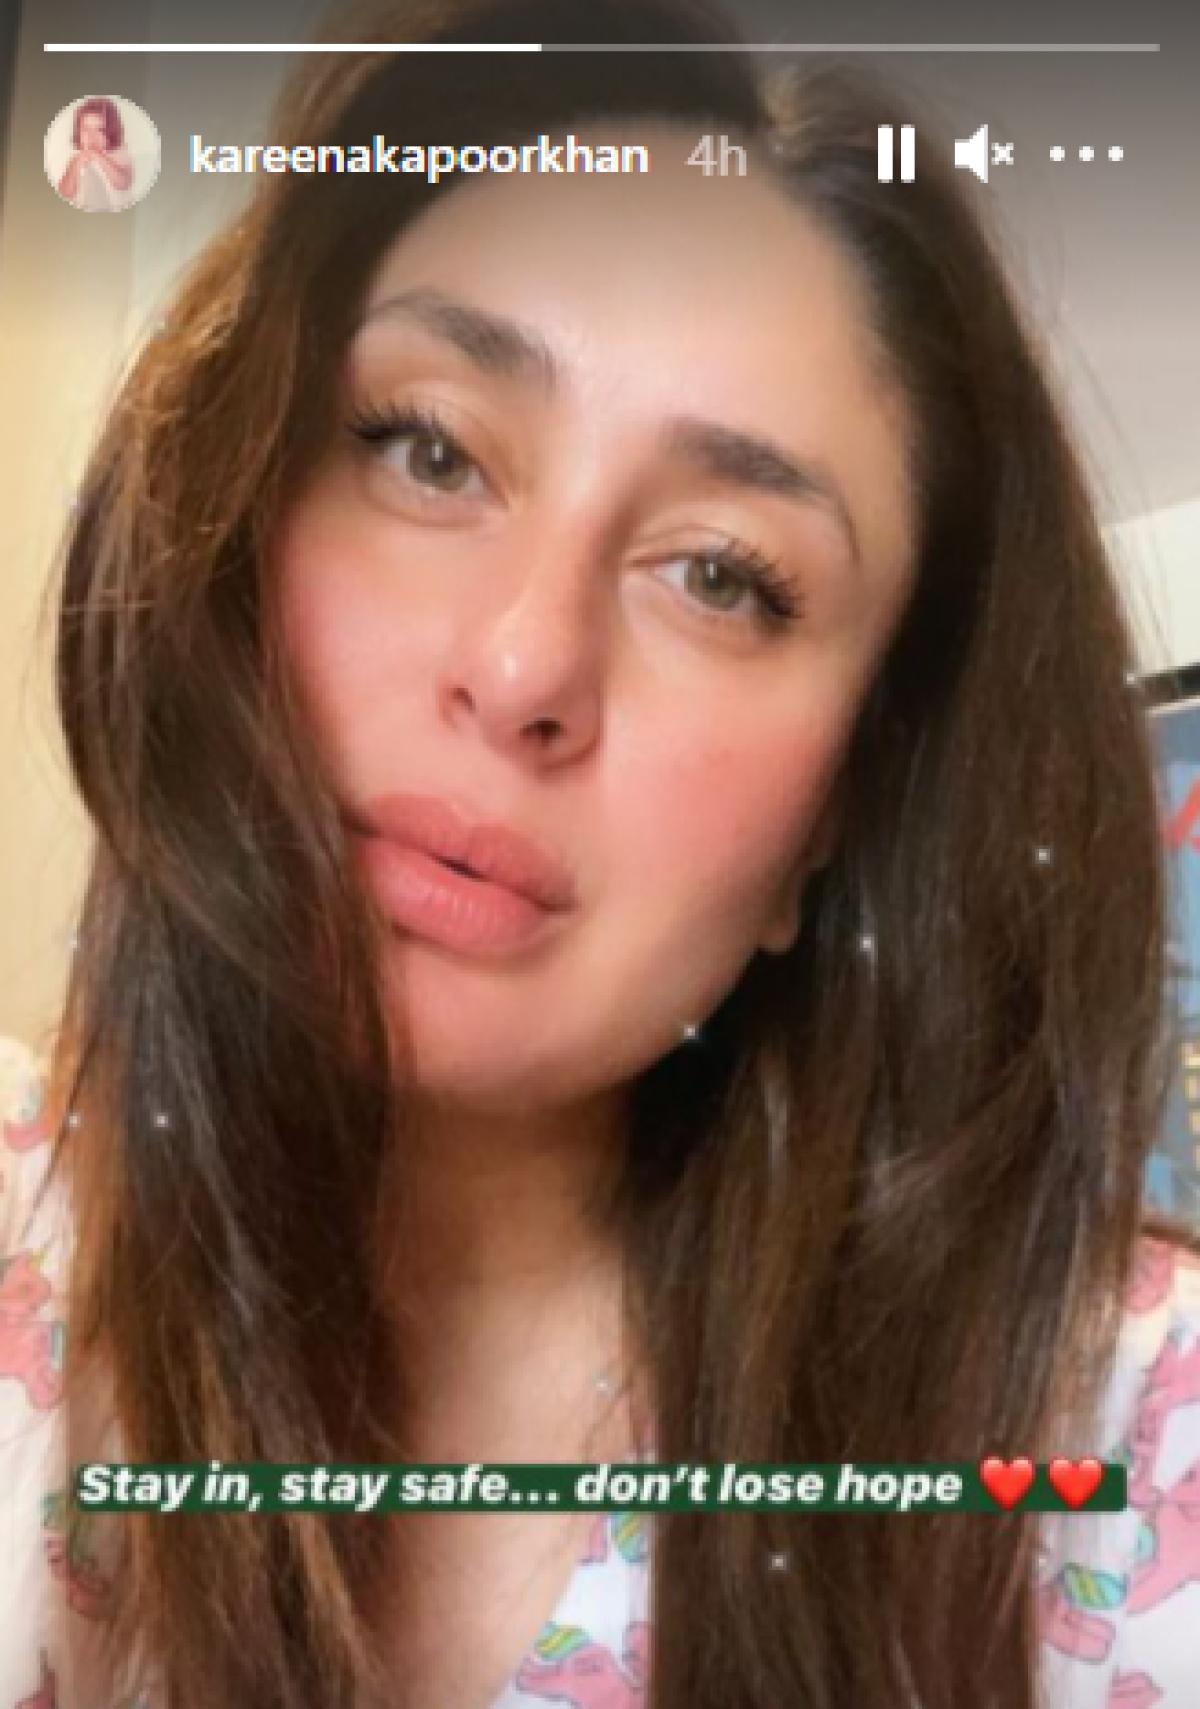 Kareena Kapoor Khan shares stunning Sunday post, urges people to not lose hope amid COVID-19 pandemic